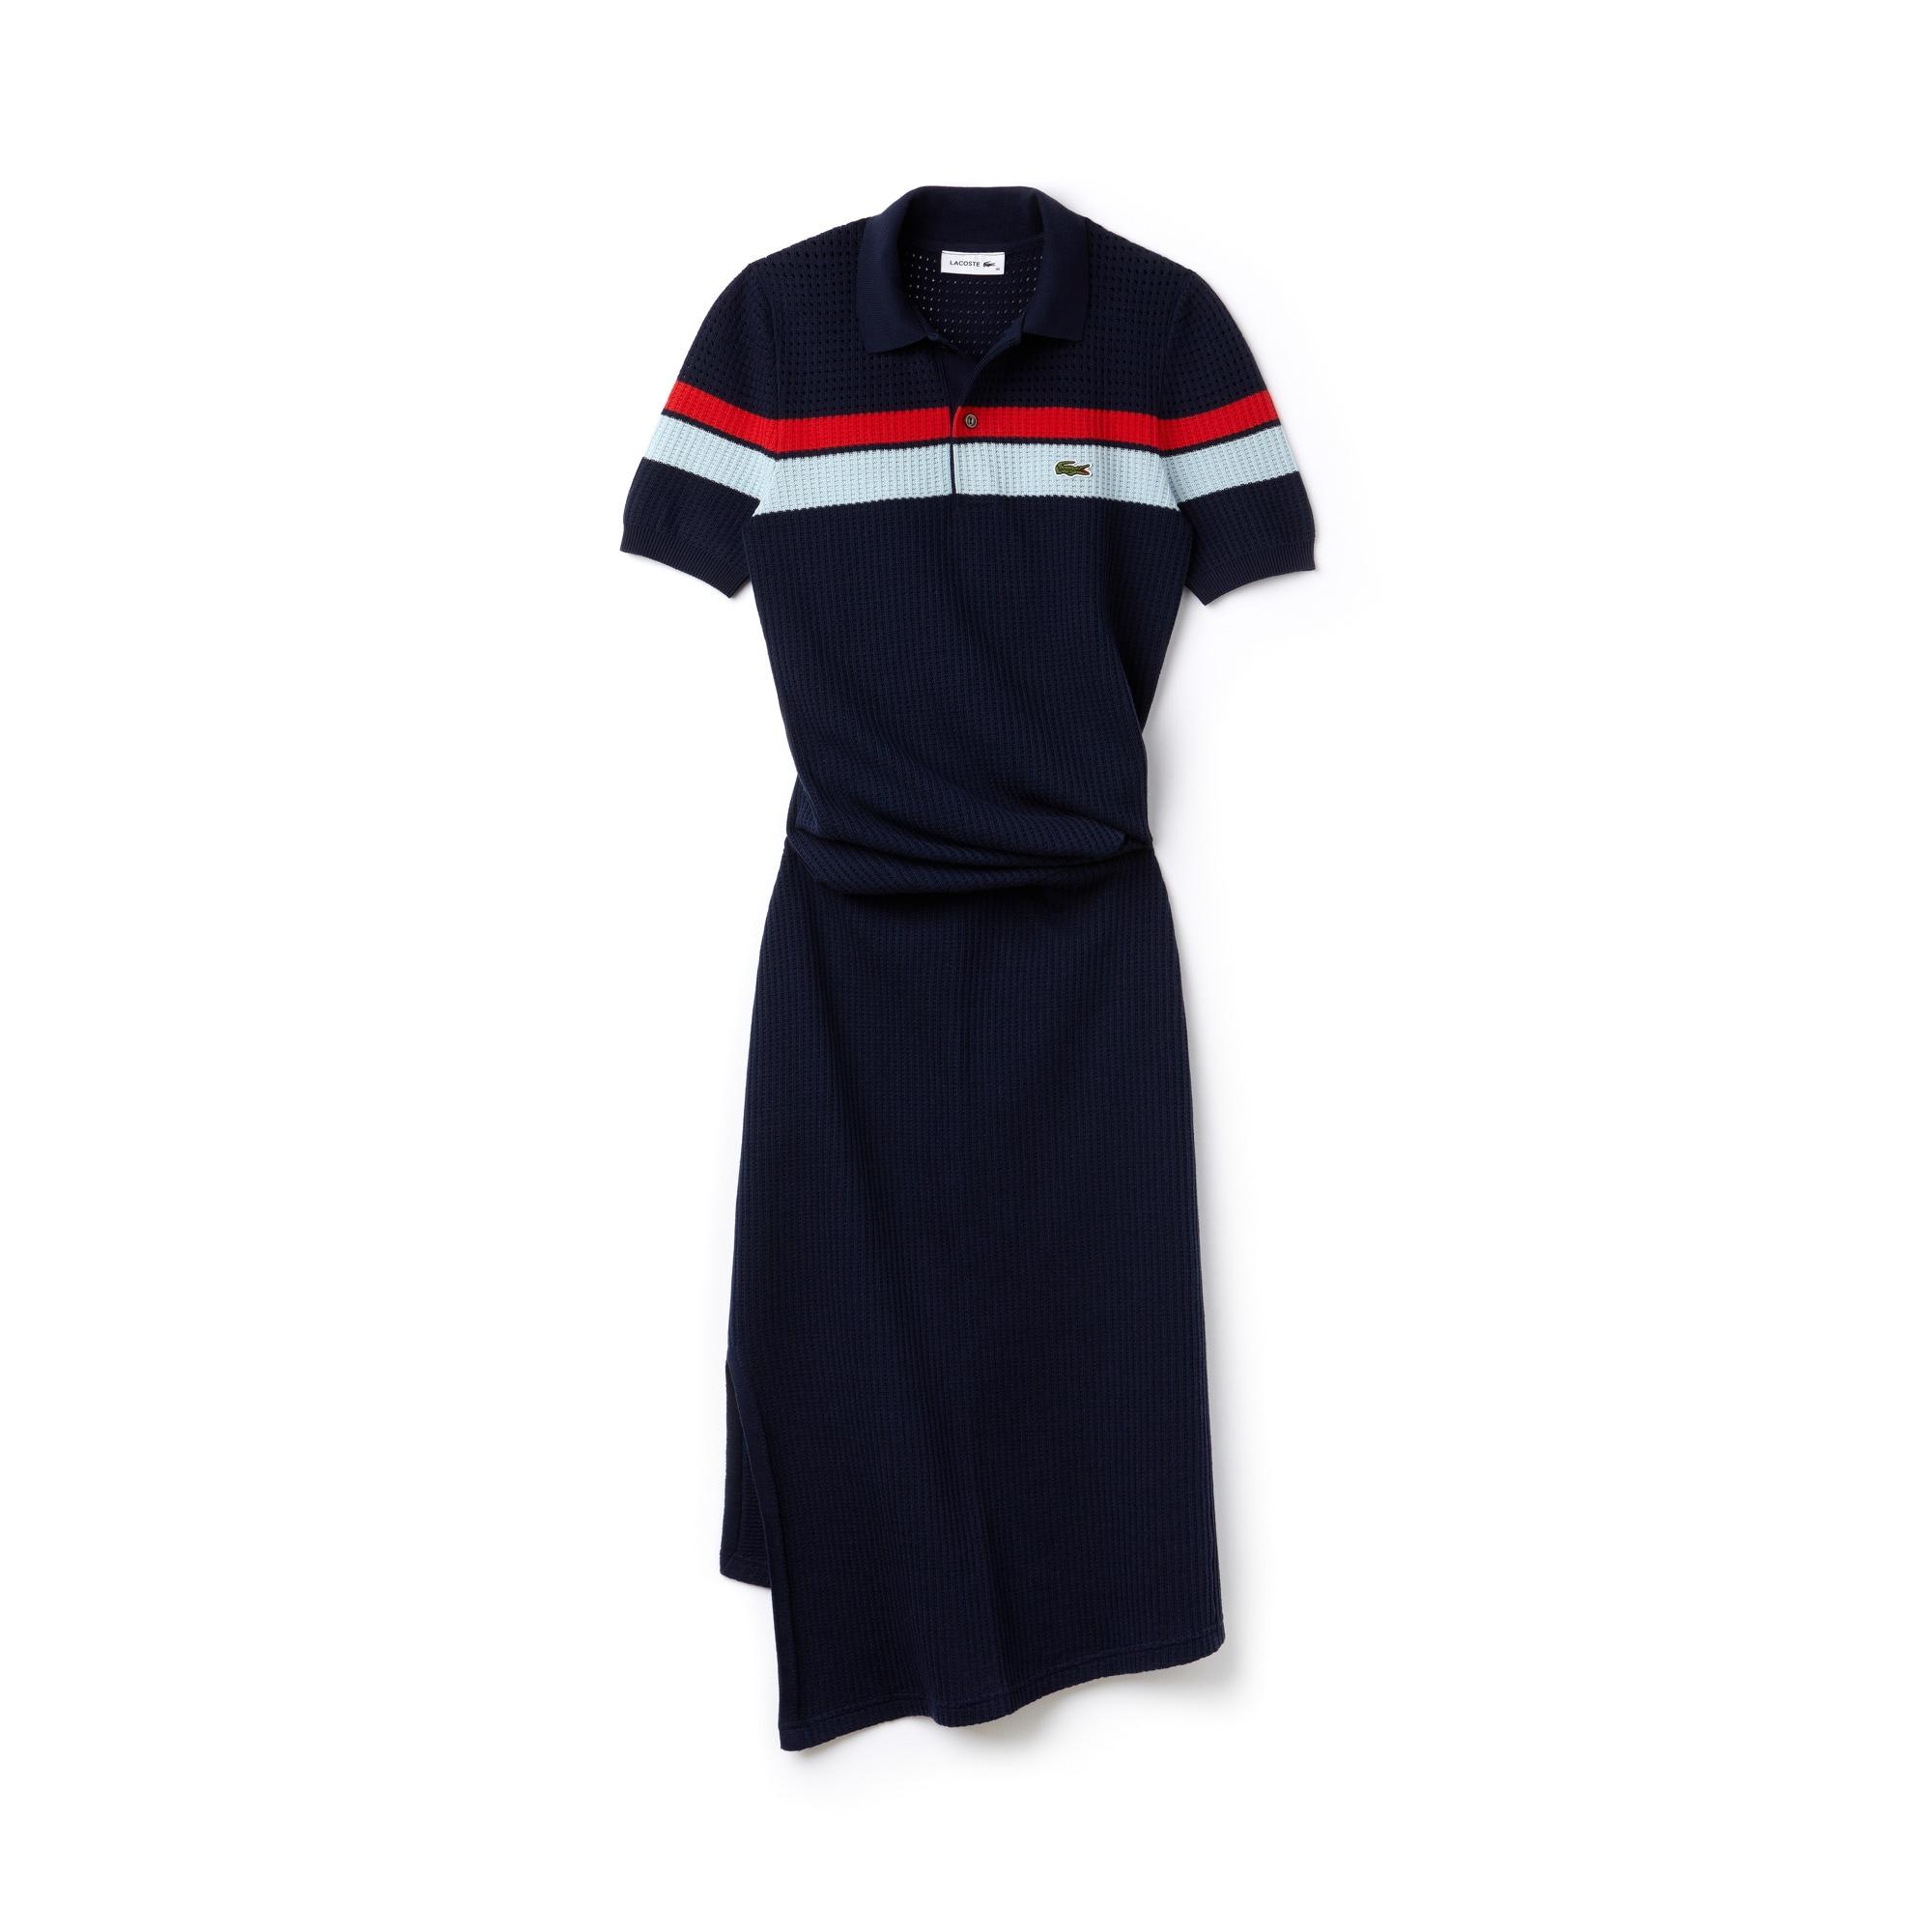 Women's Fashion Show Striped Cotton Knit Twisted Polo Dress